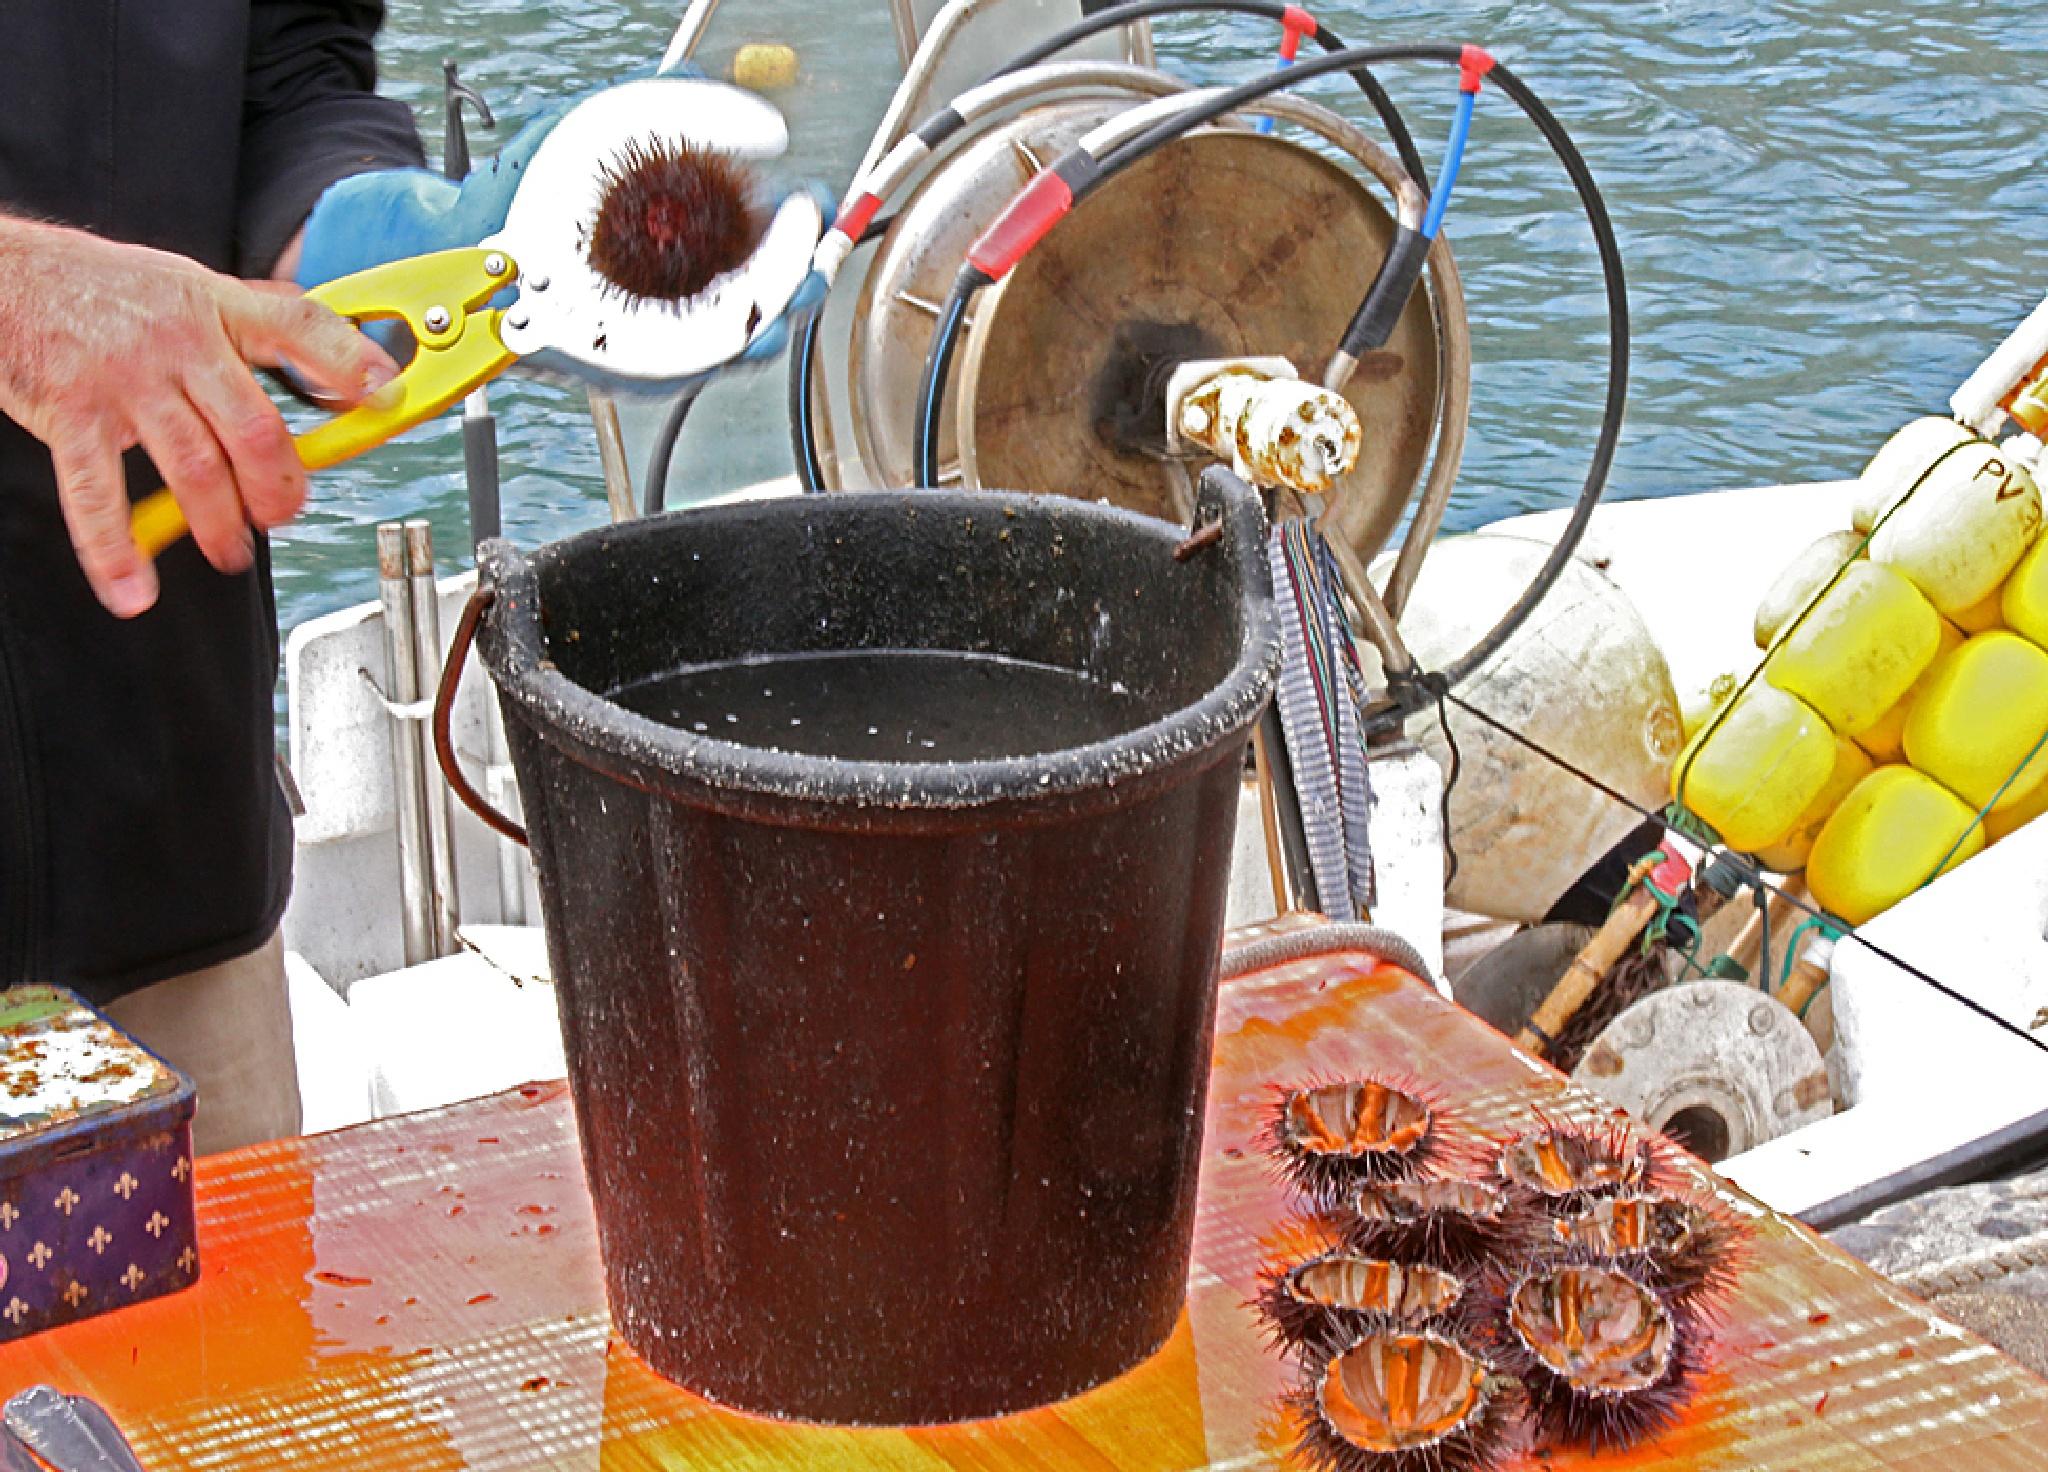 Collioure - Sea Urchins by Carl Main